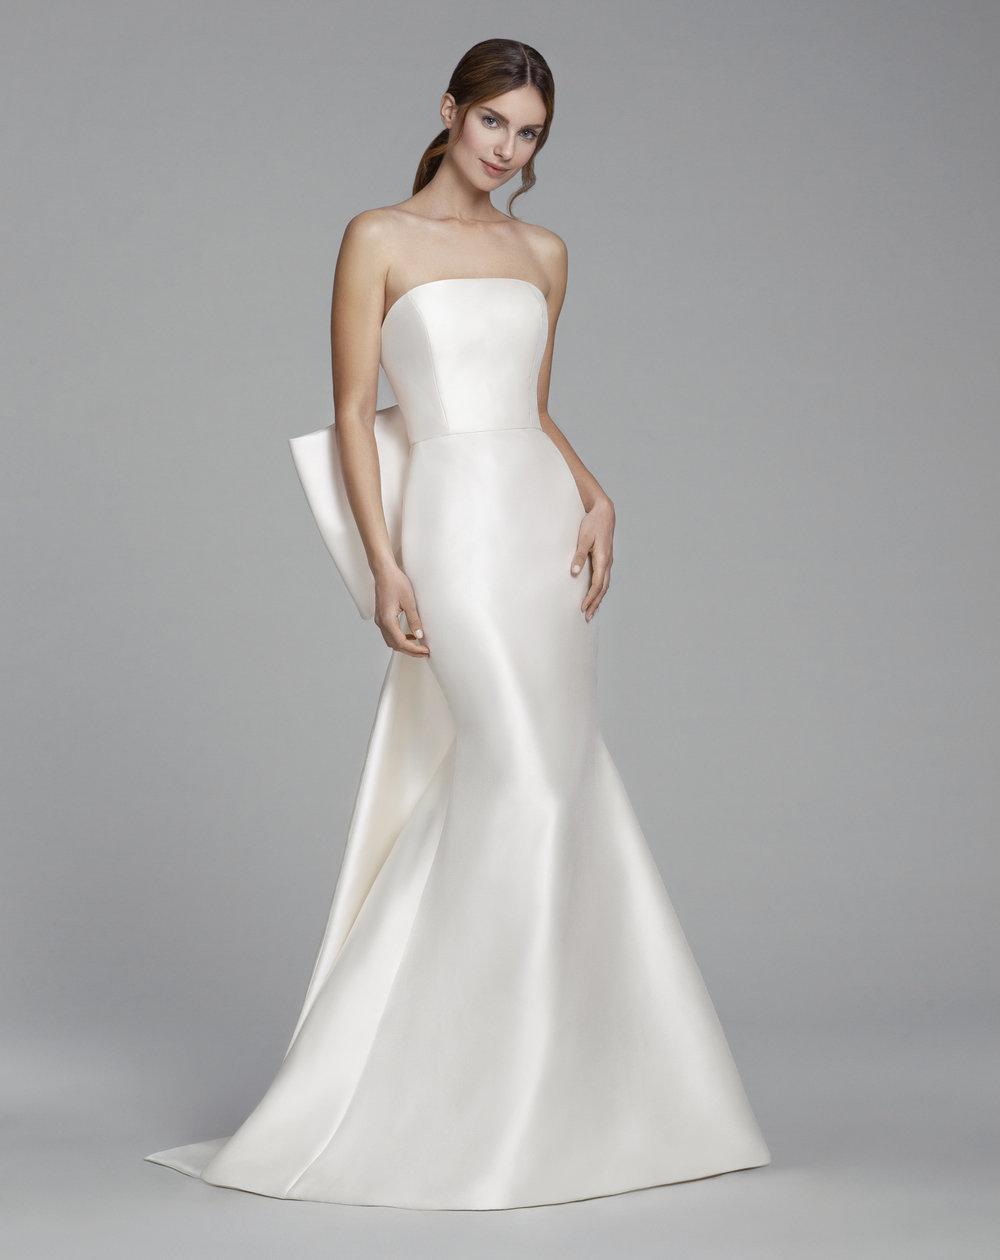 Style 2860:Diana